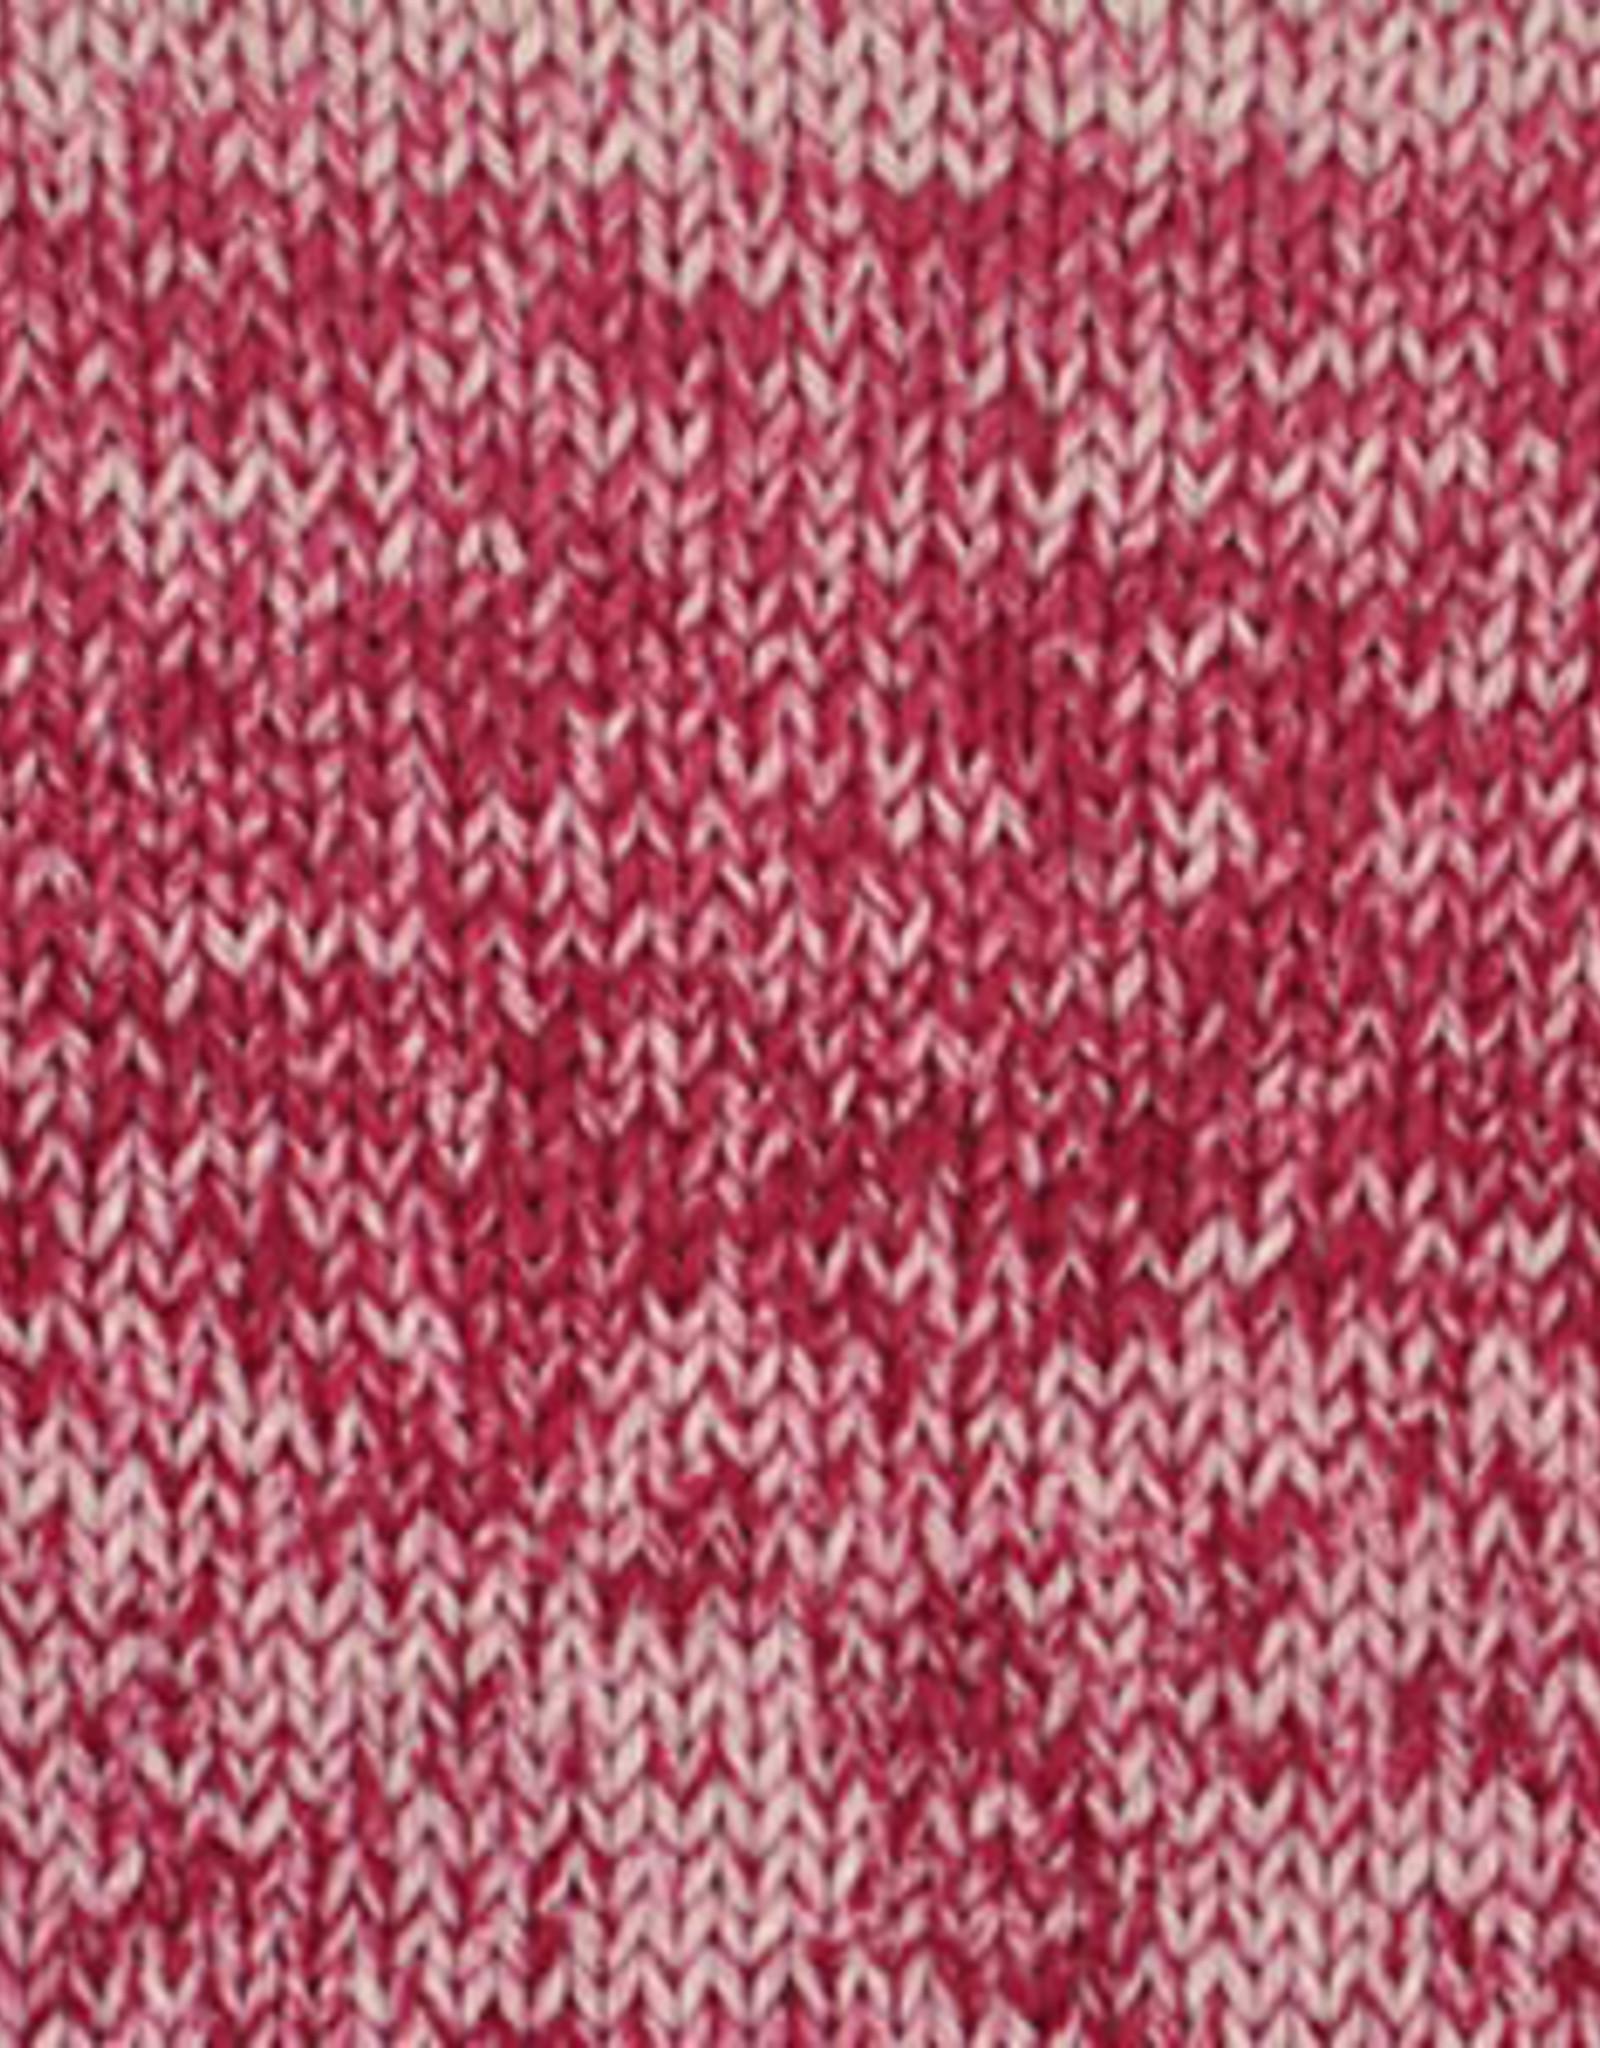 Universal Yarn Cotton Supreme DK Seaspray 313 Adobe